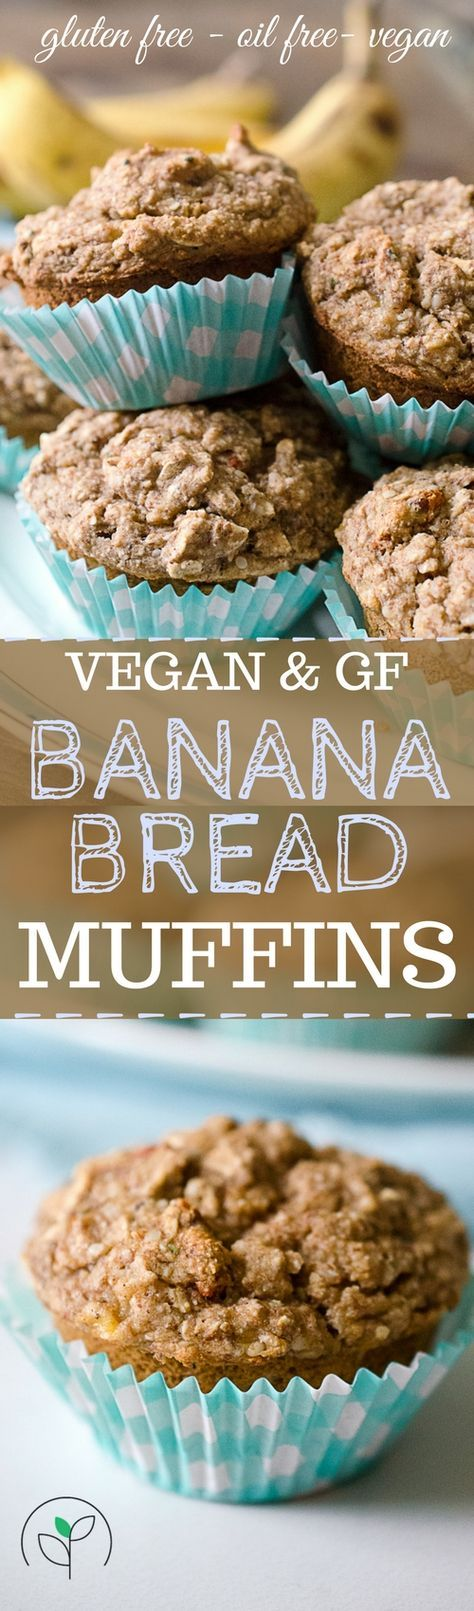 Vegan gluten free banana bread muffins! Plant based recipes. Vegan, gluten free oil free recipes! Vegan muffin recipes.